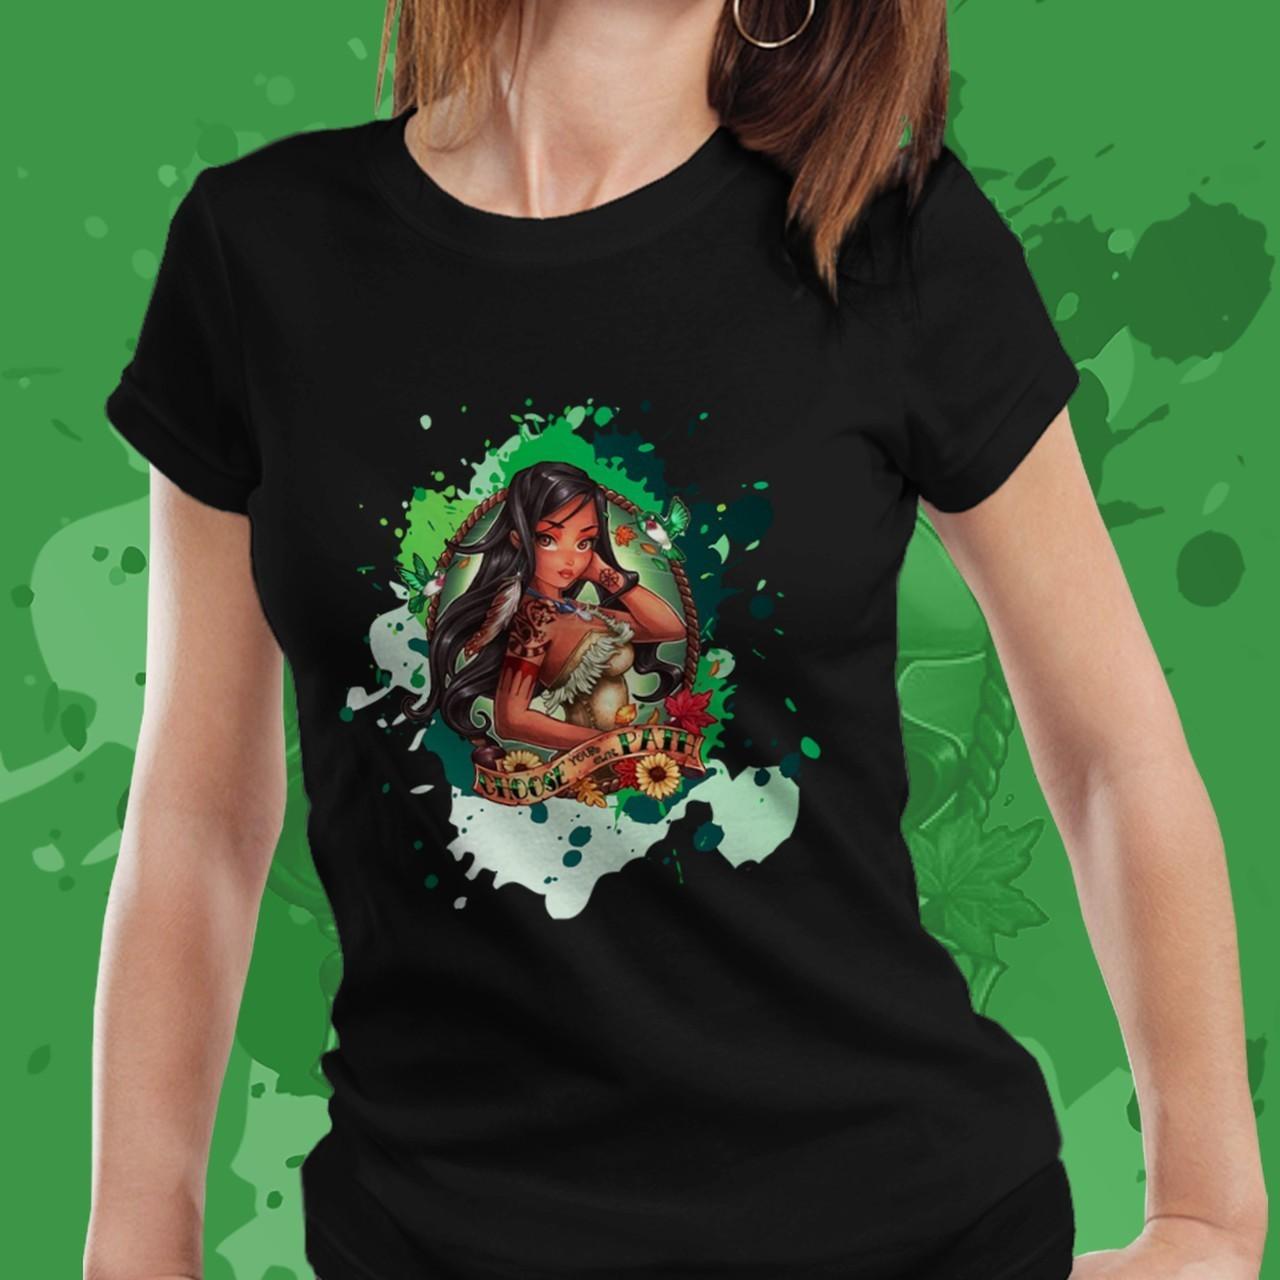 Camiseta Feminina Pocahontas: Pocahontas - Disney (Preto) - EV